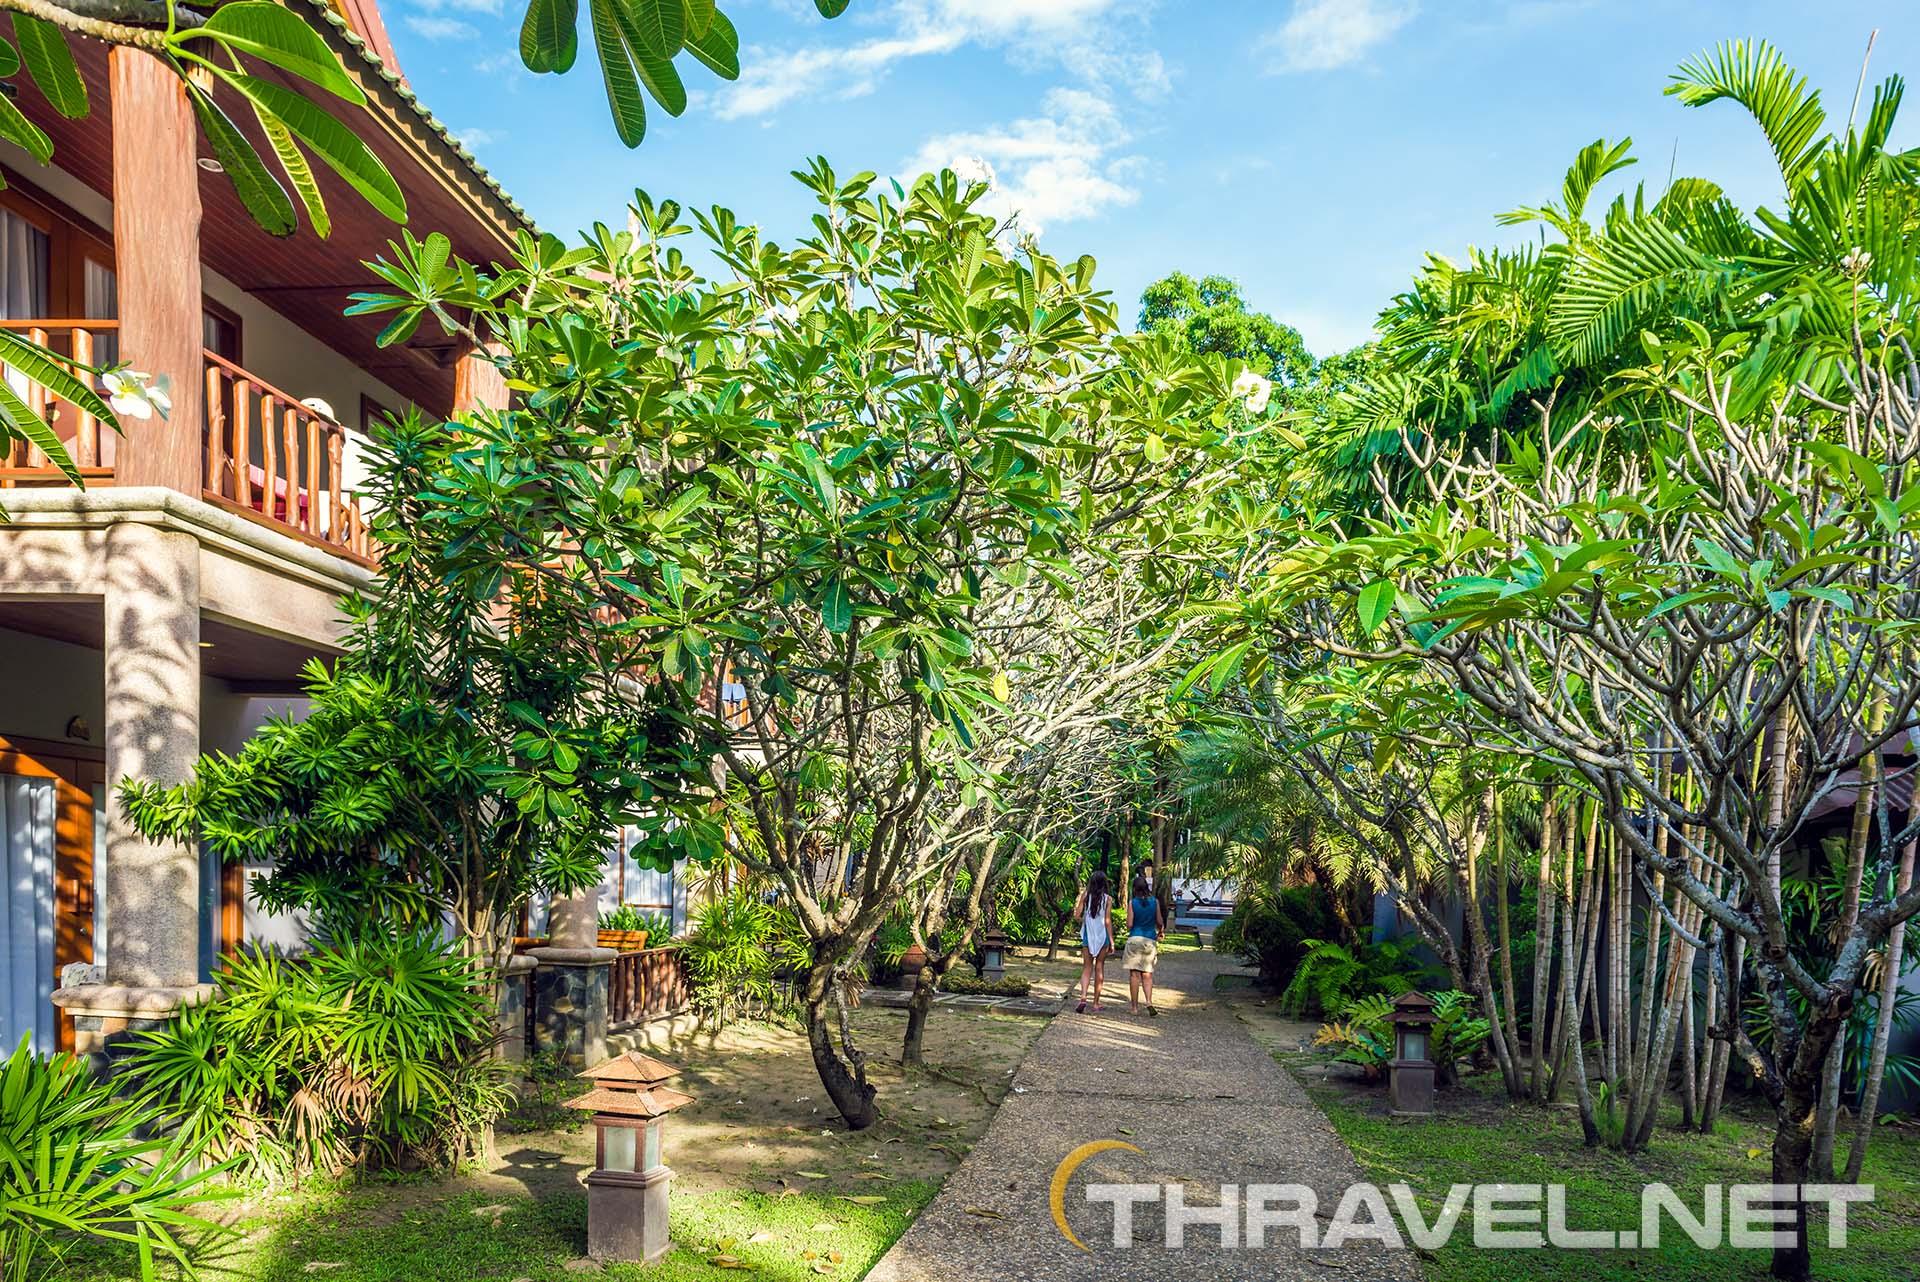 Railey-beach-hotels-garden